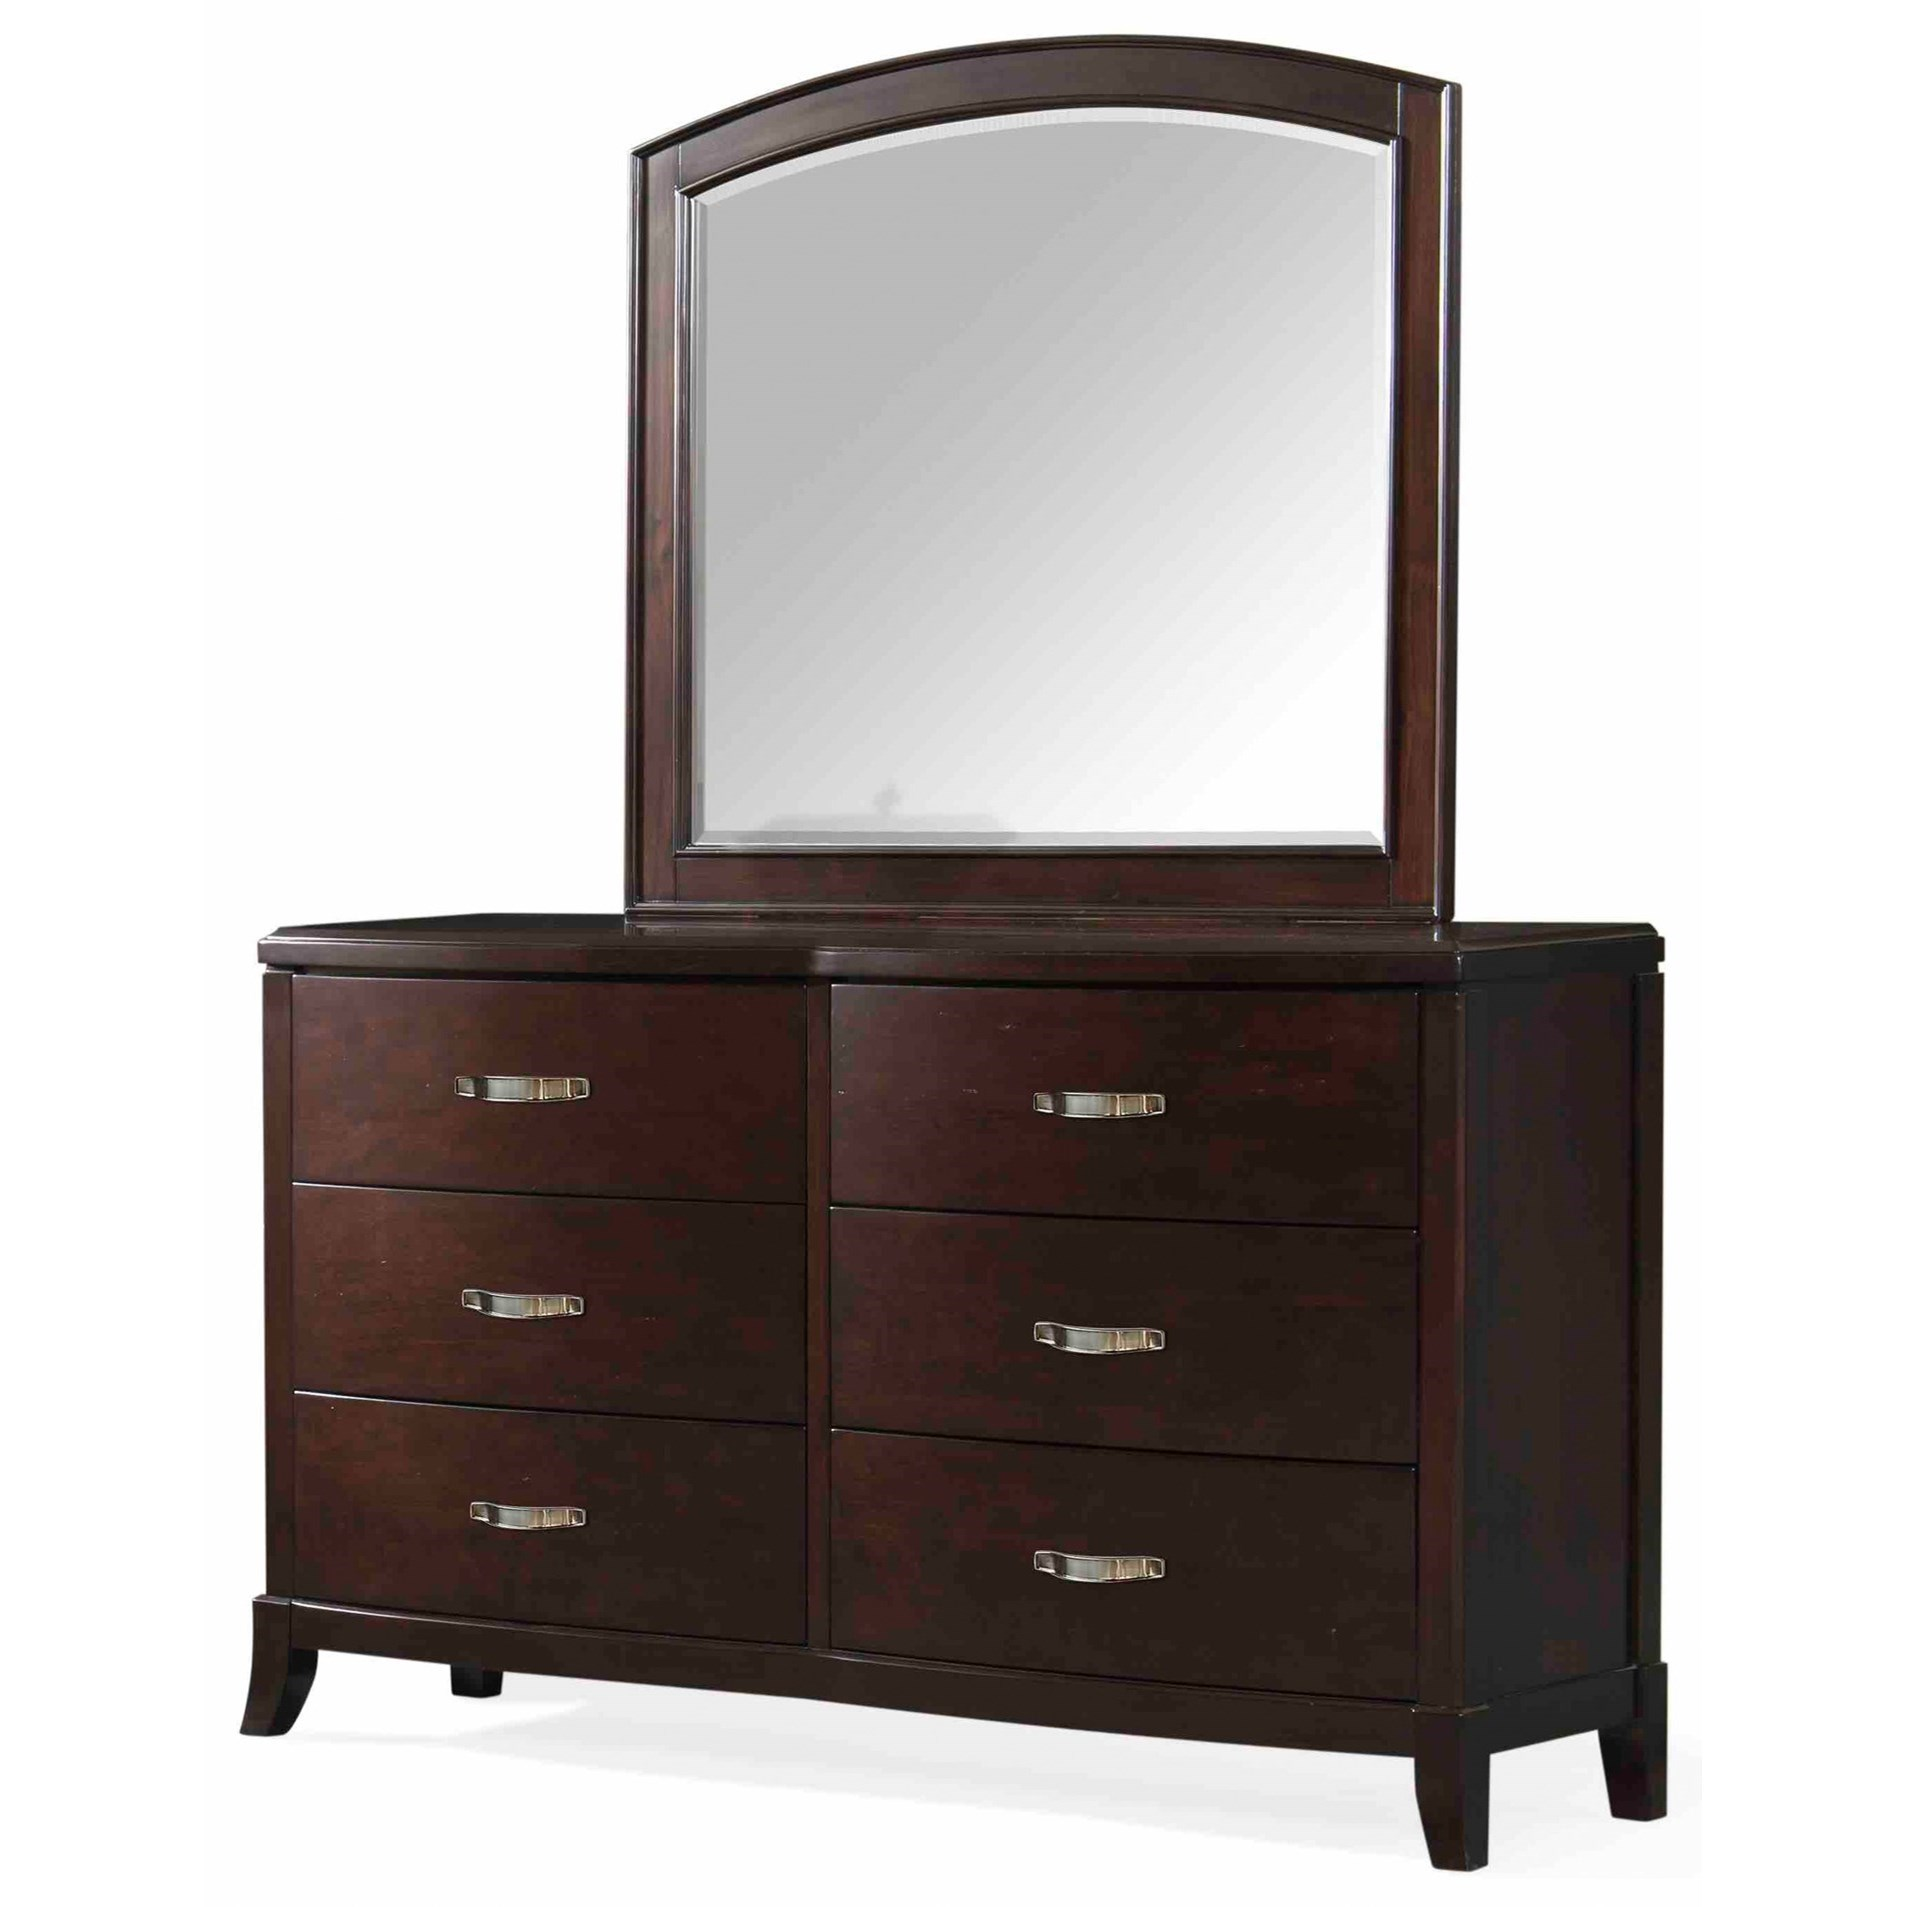 Delaney Dresser and Mirror by Elements International at Becker Furniture